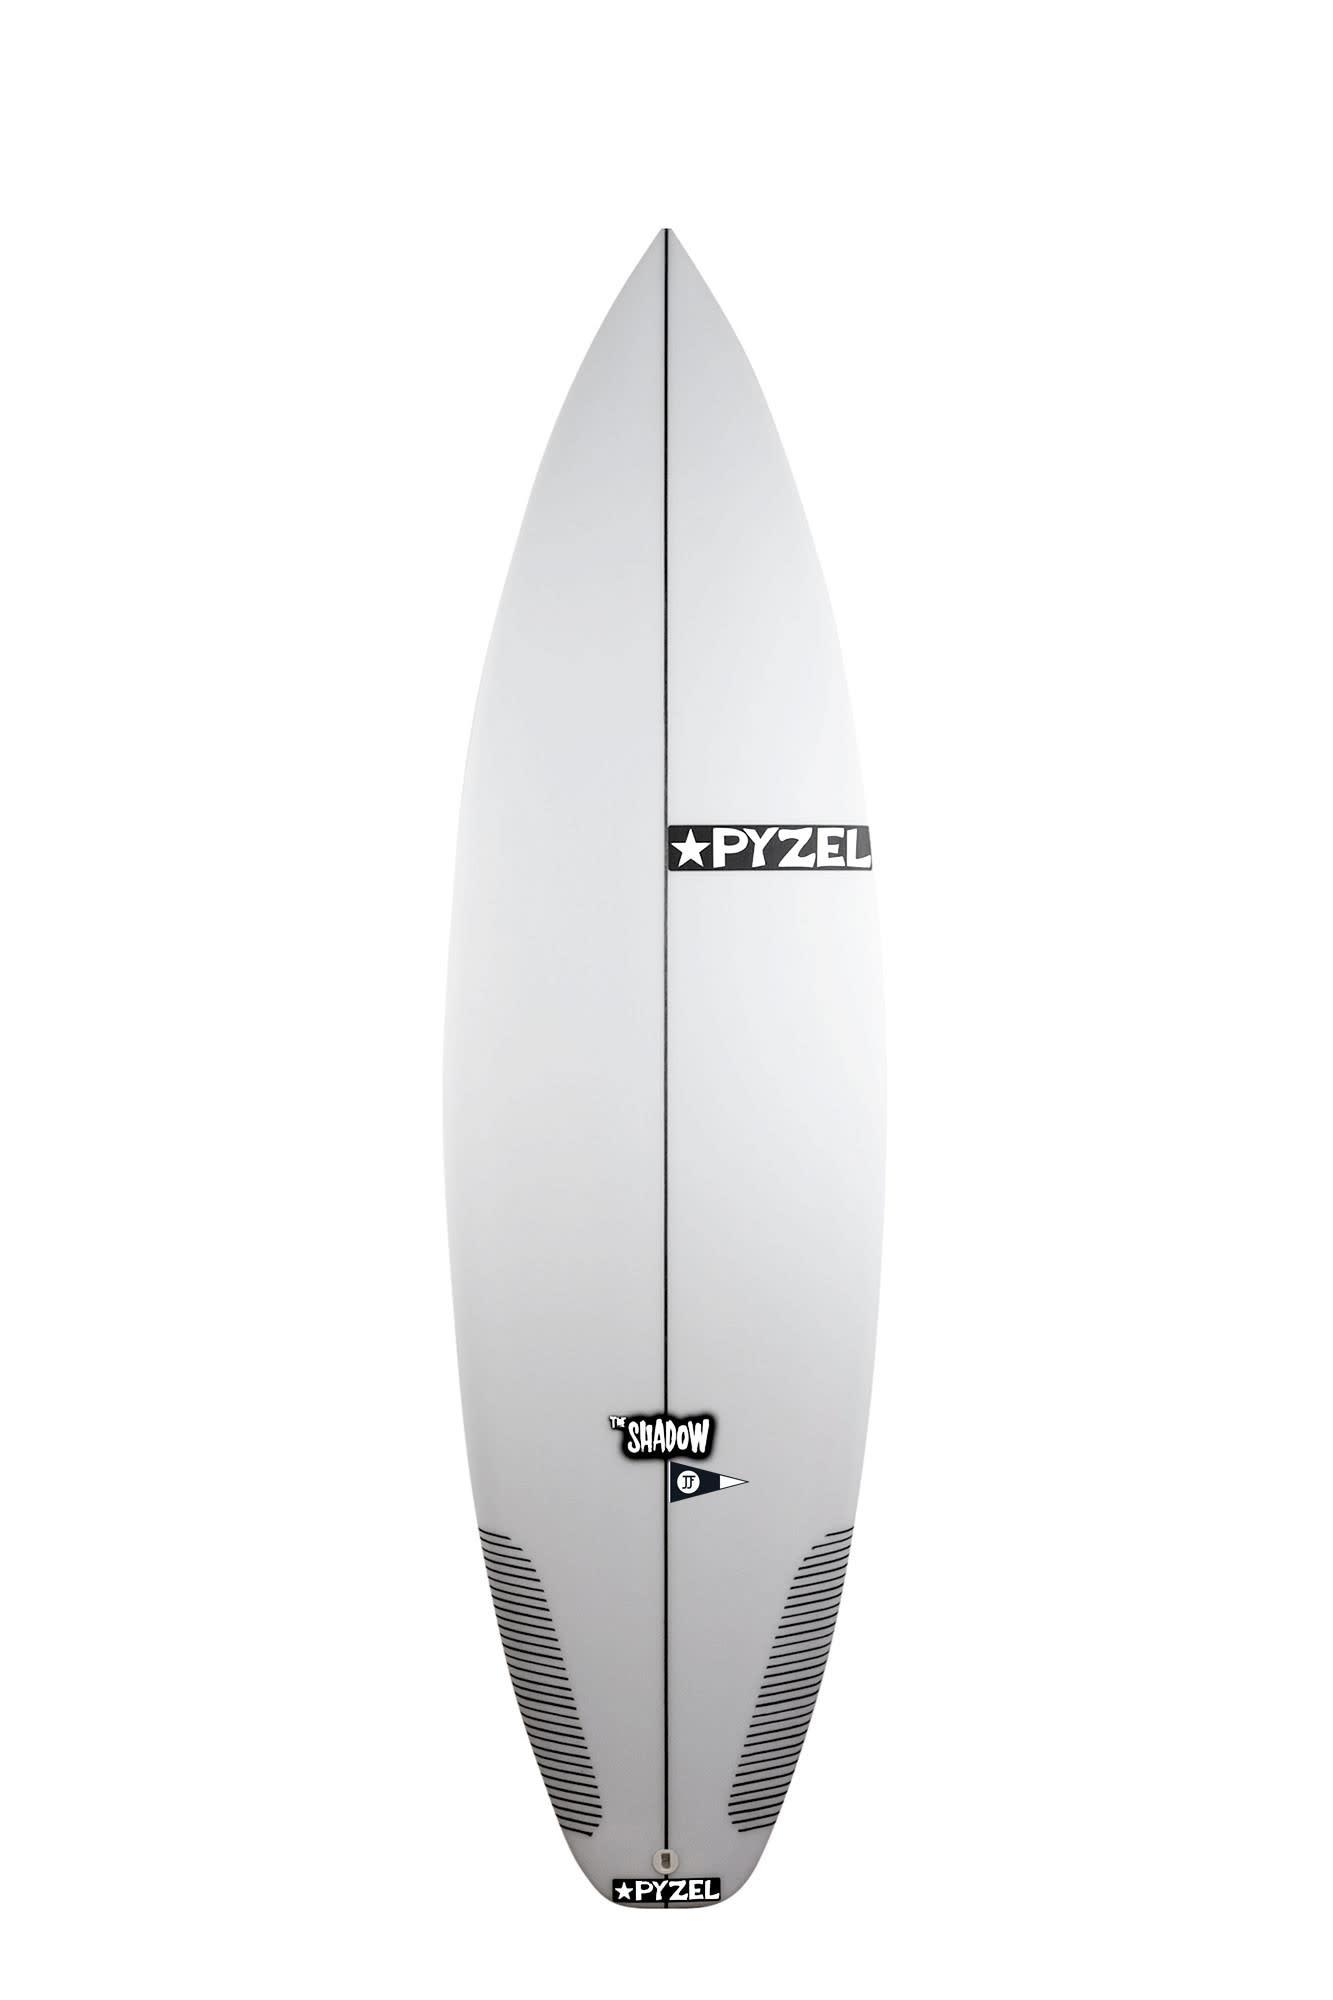 PYZEL 6'1 SHADOW ELECTRALITE FCS2